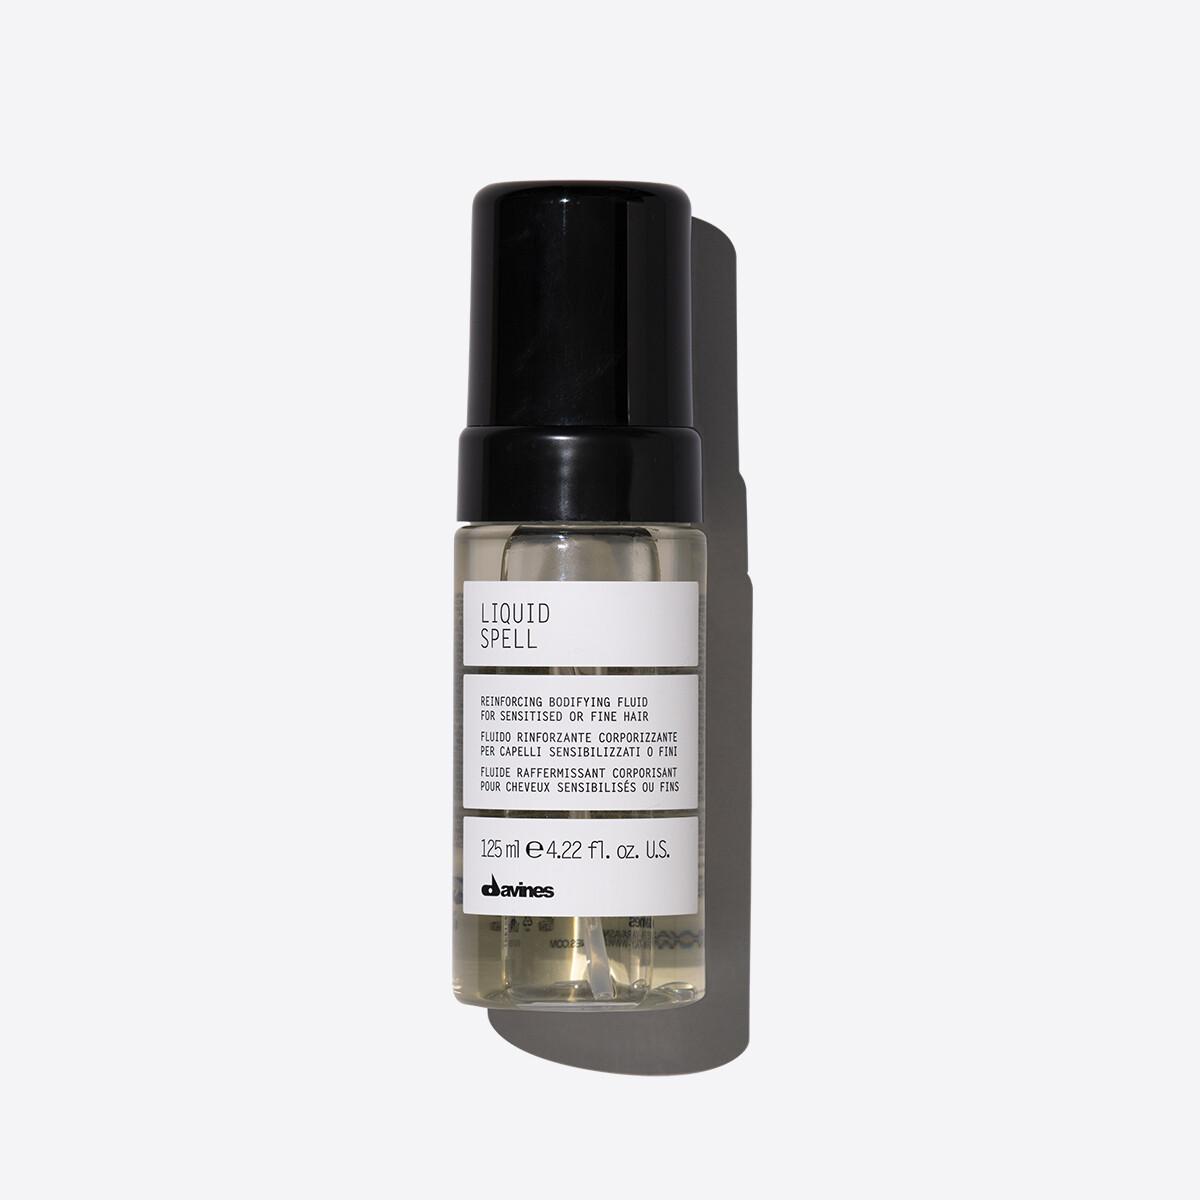 Davines Liquid Spell 125ml